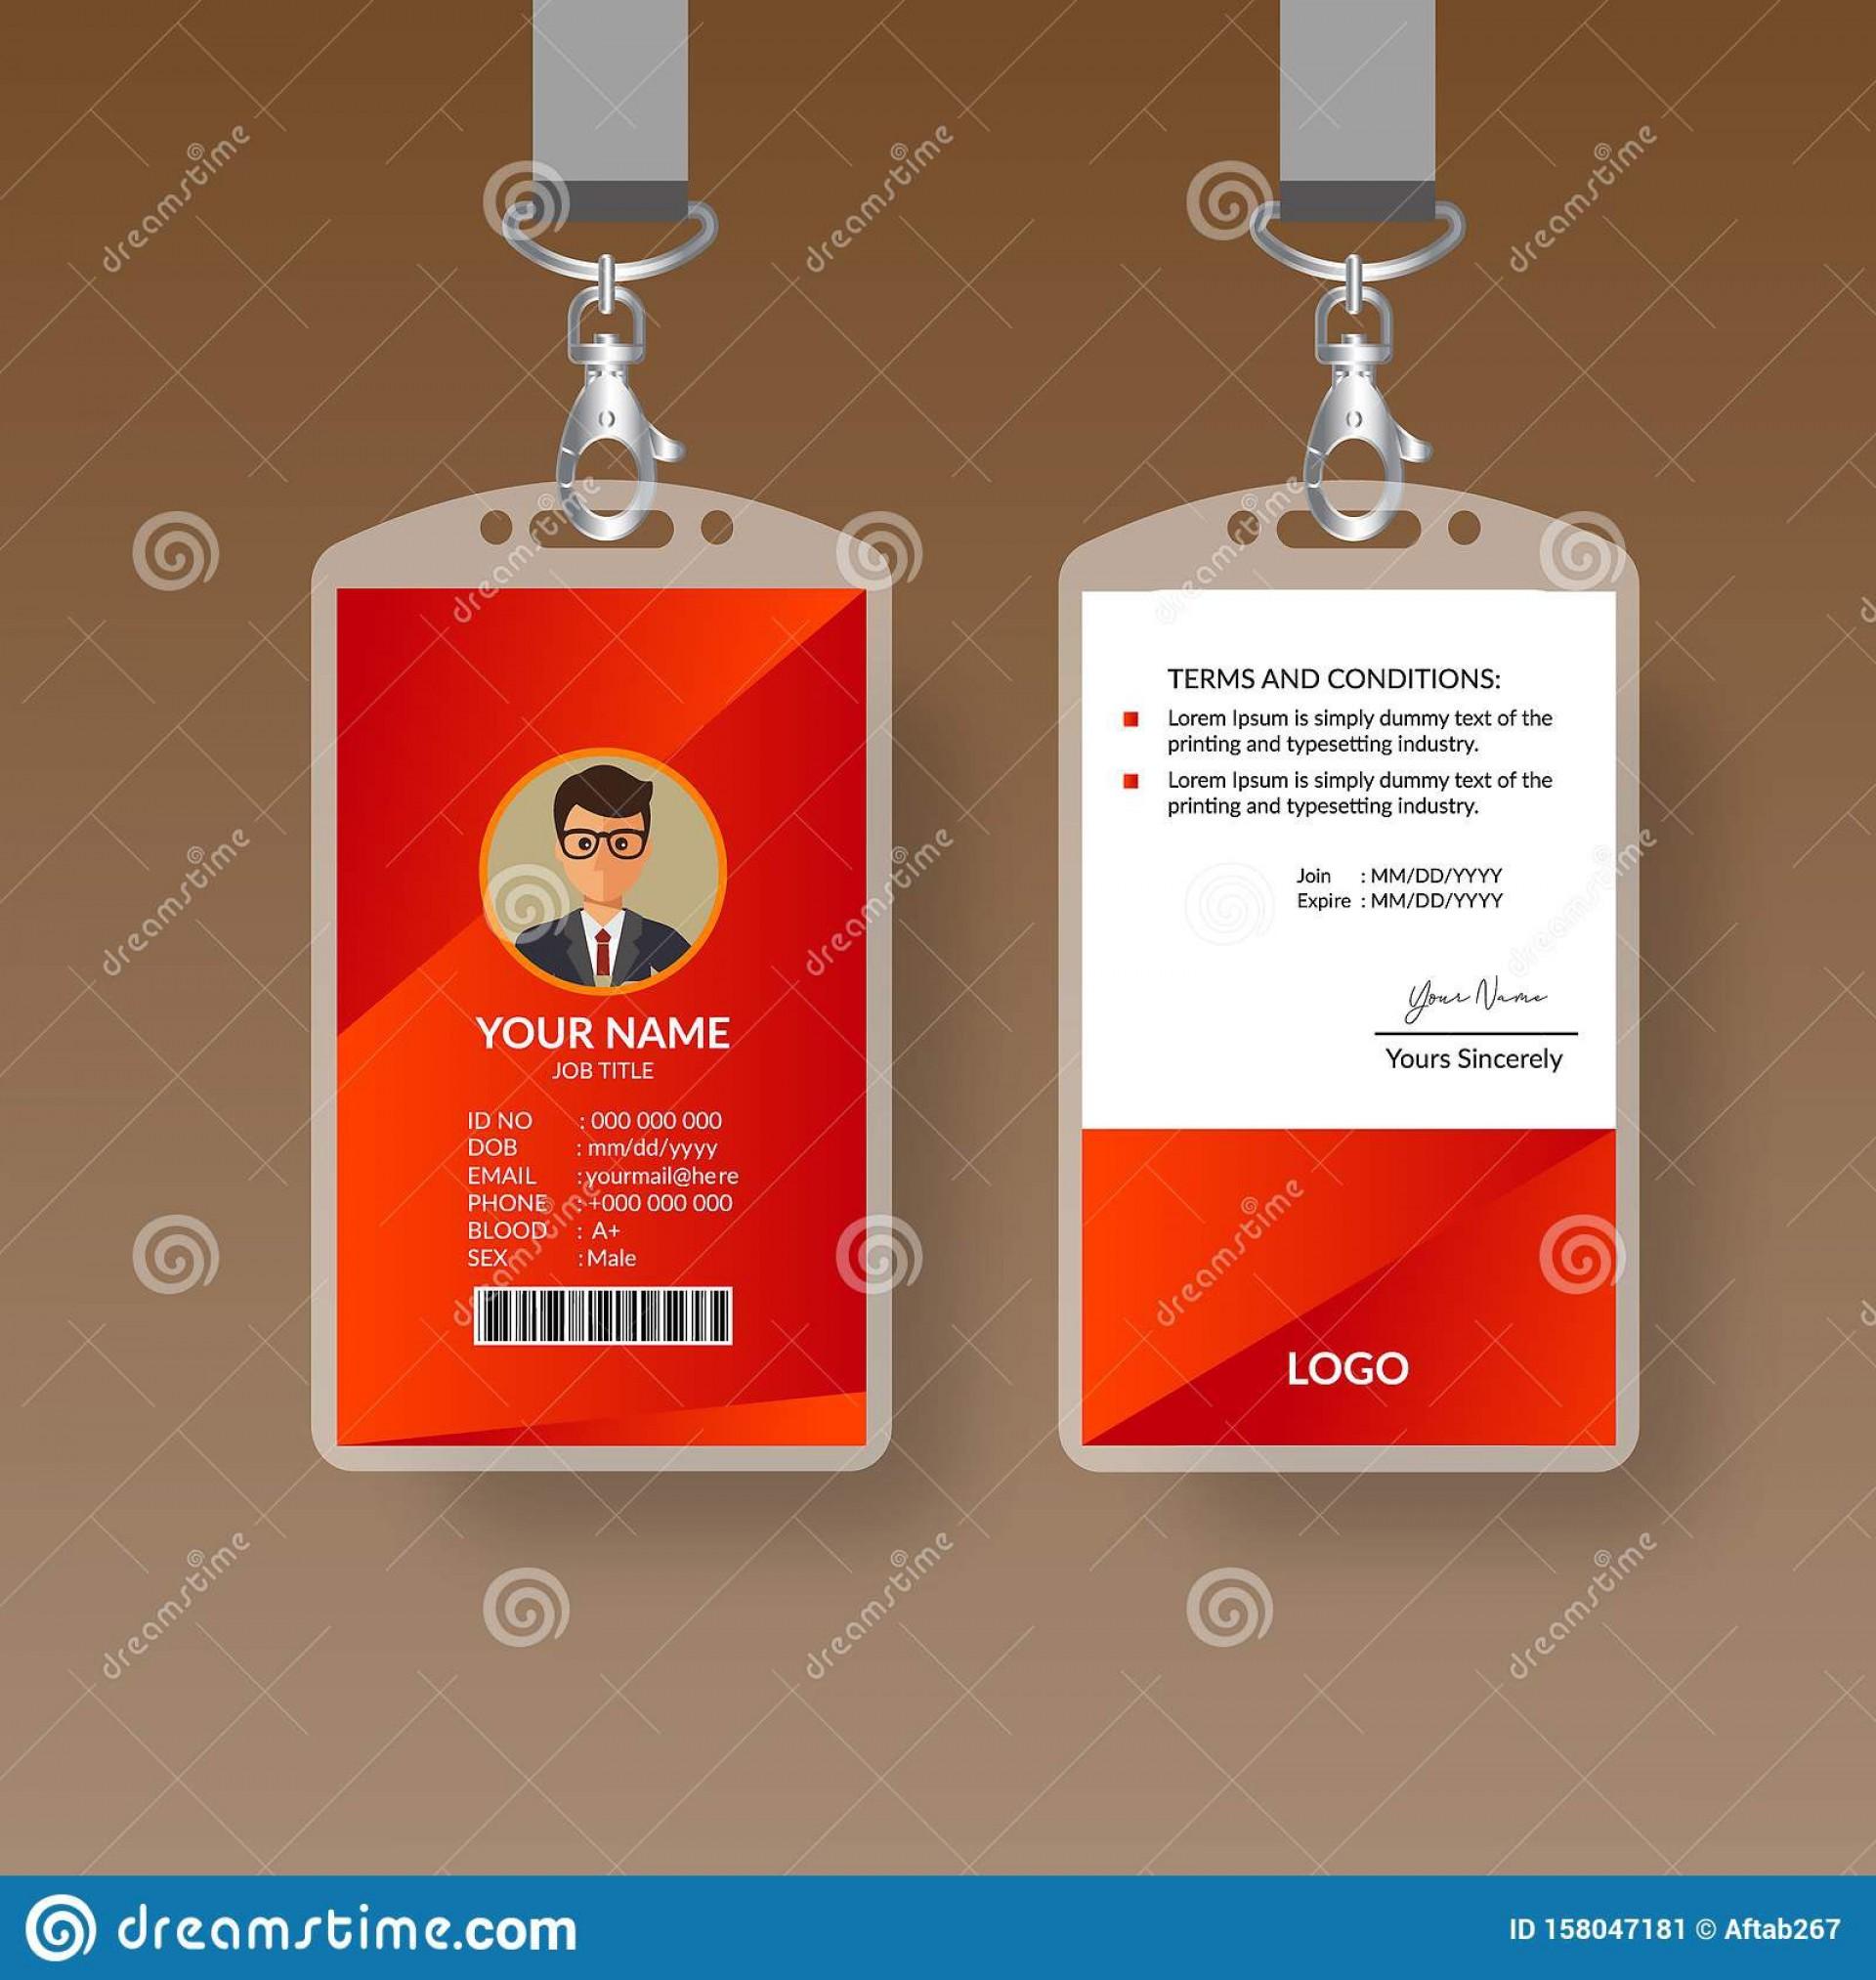 009 Shocking Free Printable Id Card Template Photo  Templates Medical Editable1920